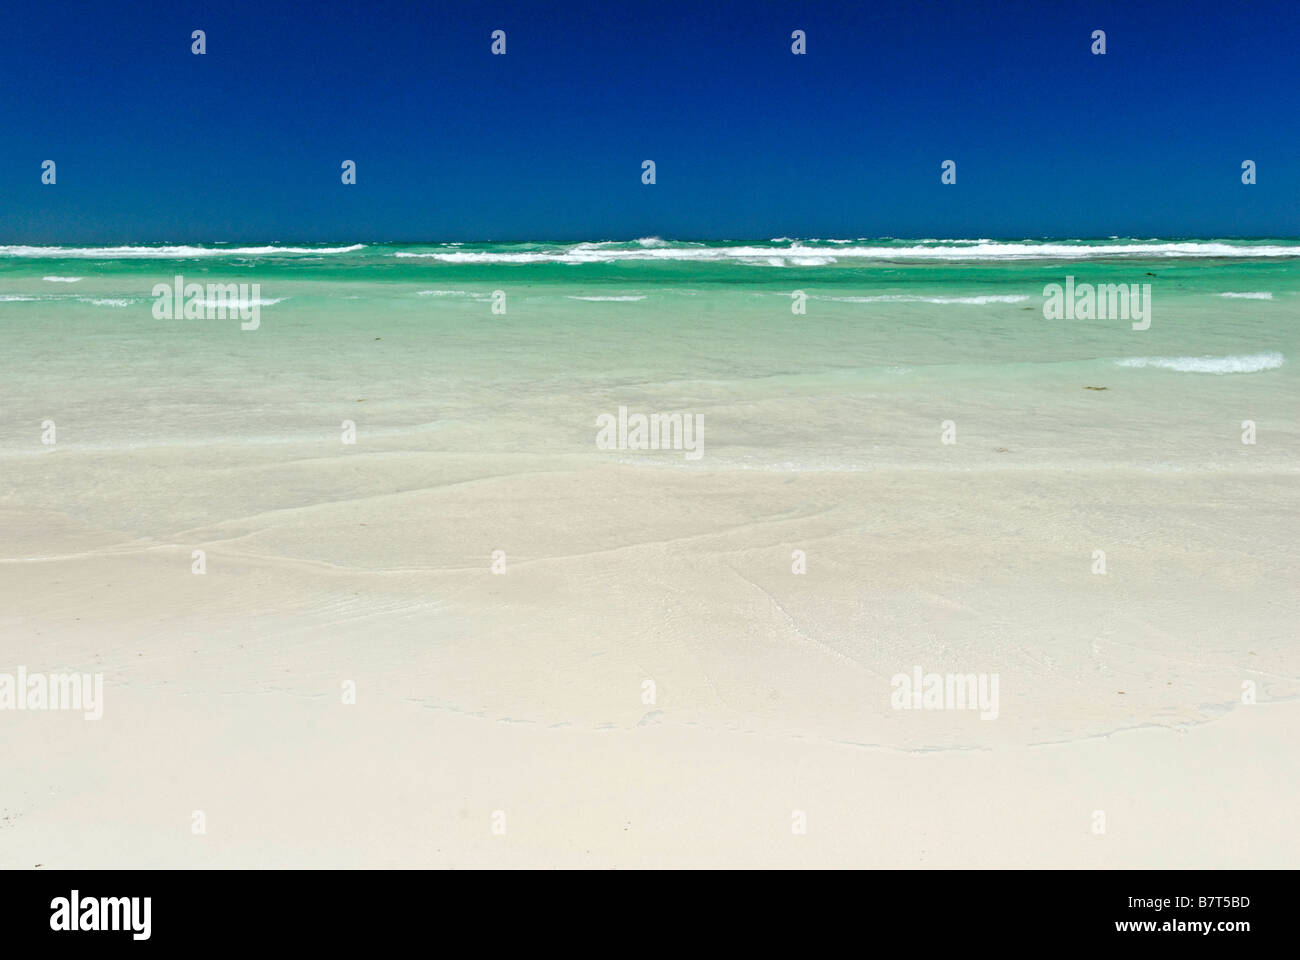 empty beach and sea summer Western Australia coast between Lancelin and Cervantes Stock Photo